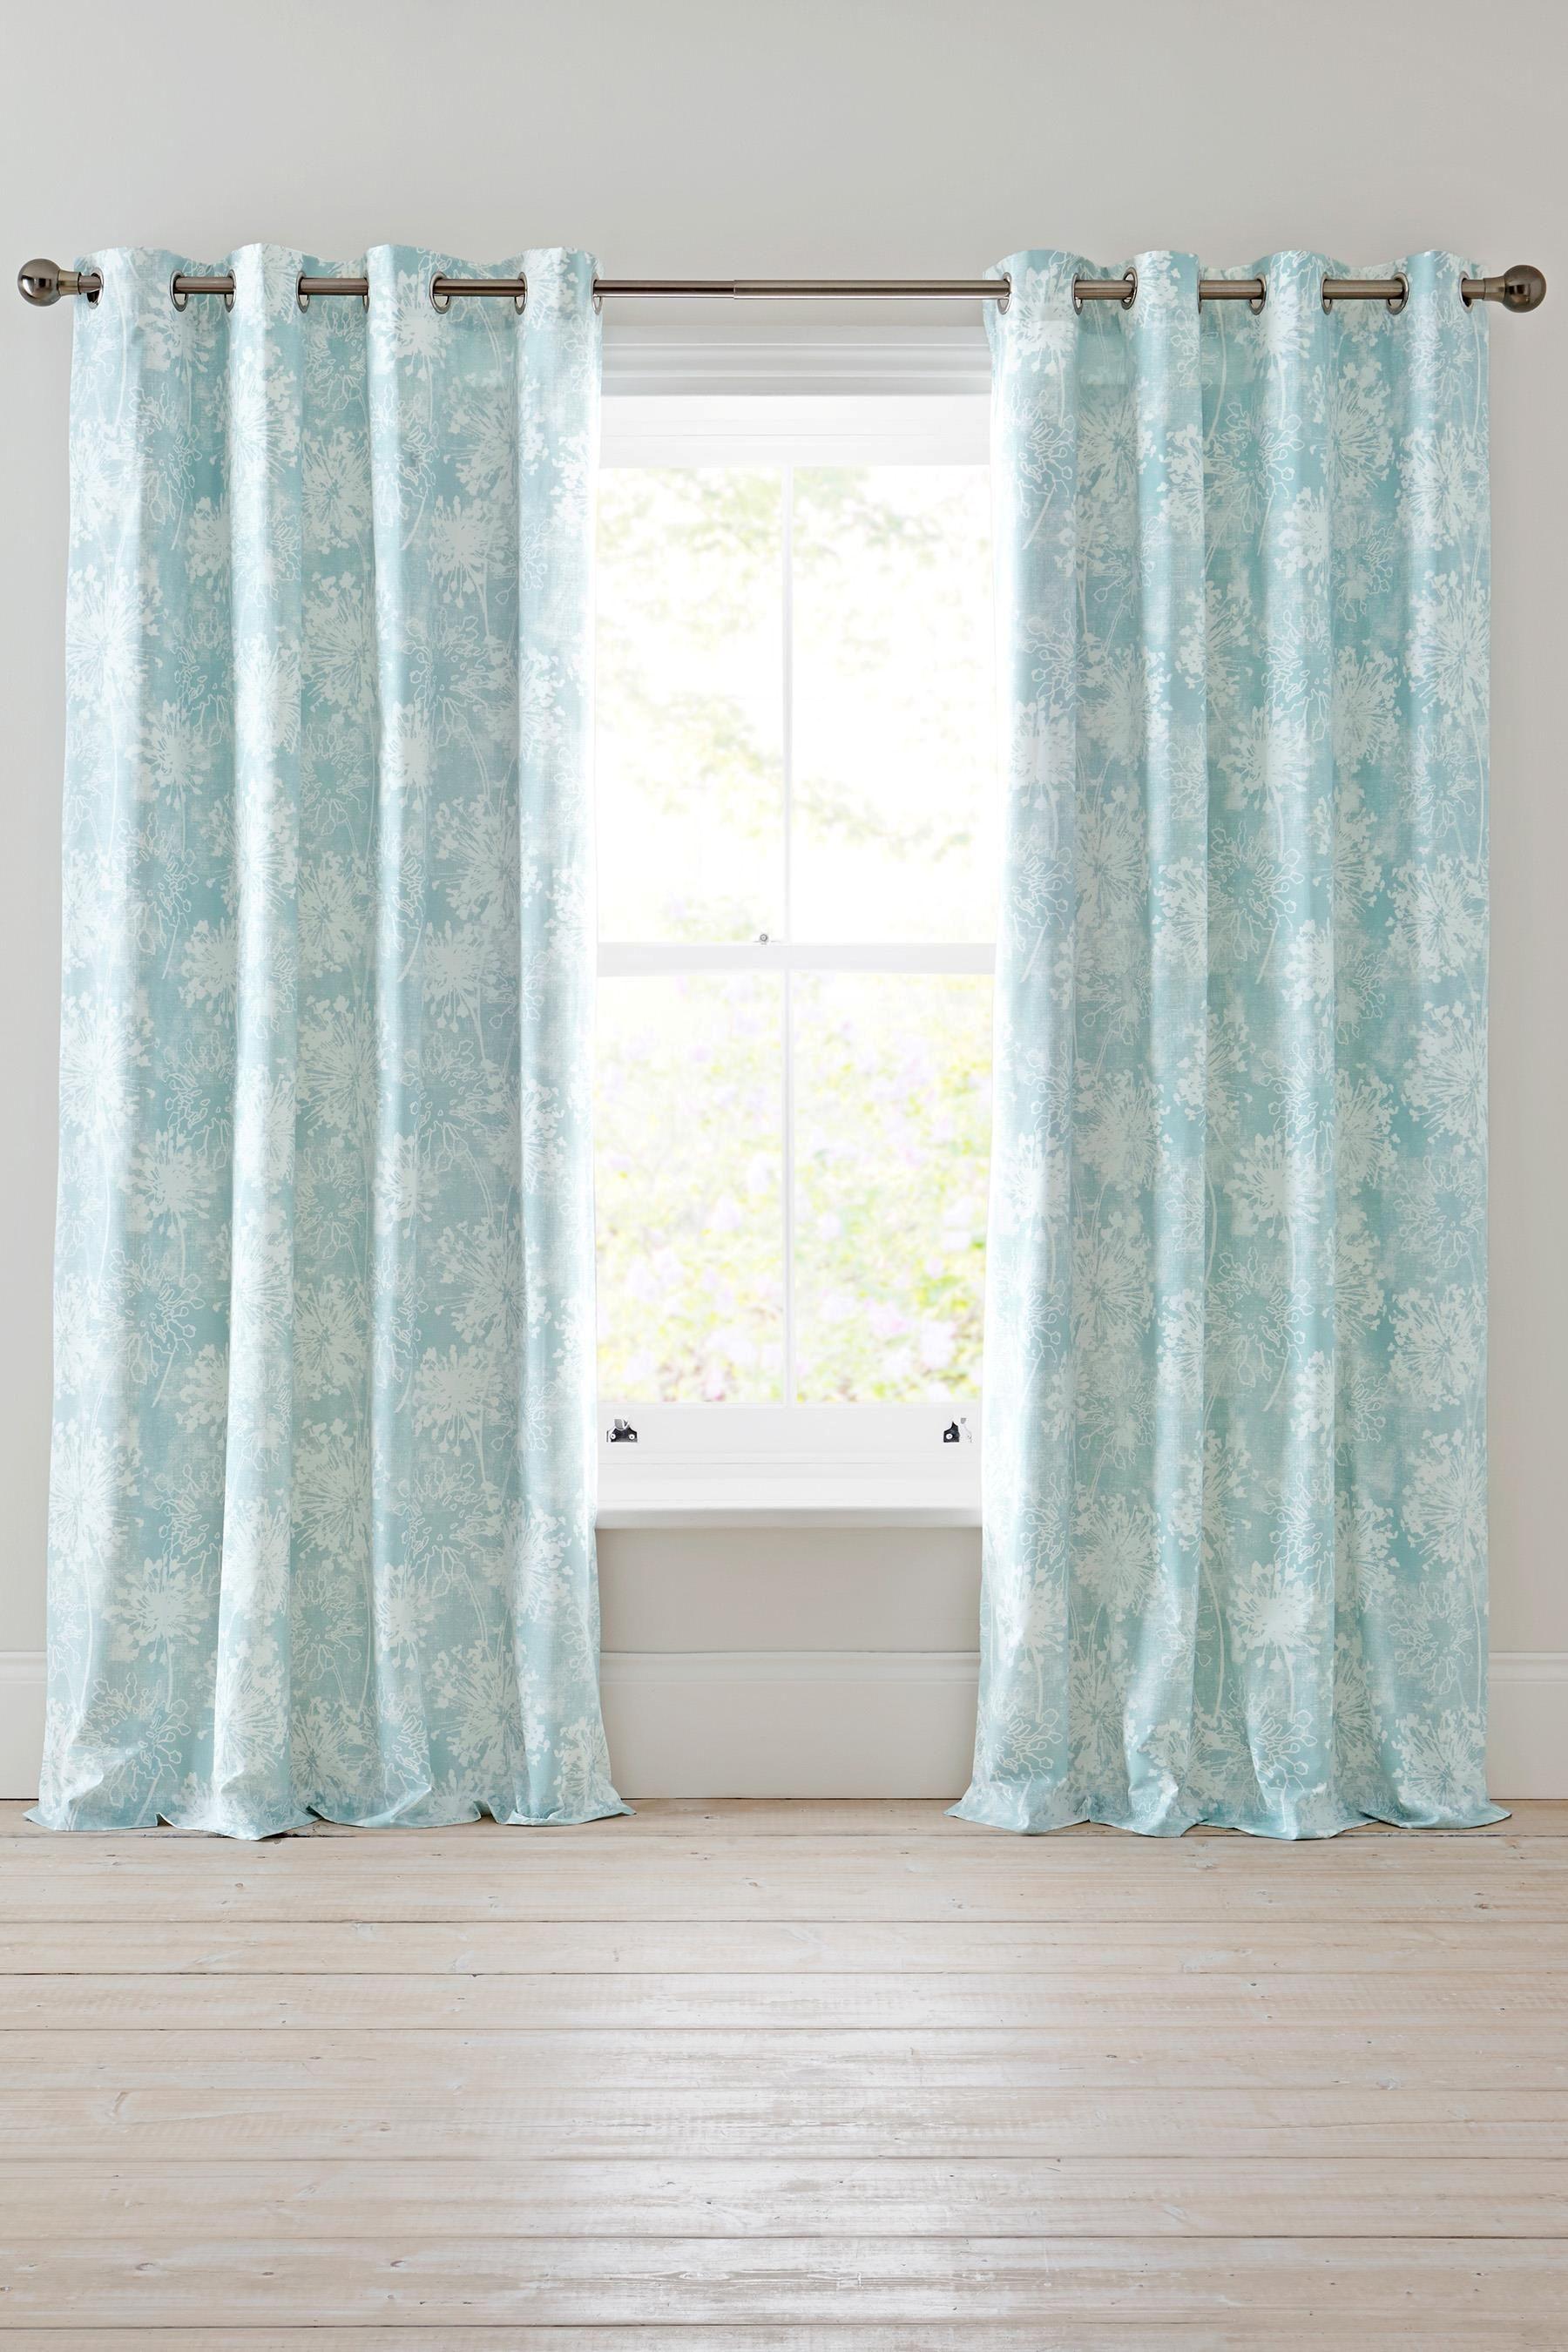 Buy Soft Aqua Wild Allium Print Eyelet Curtains From The